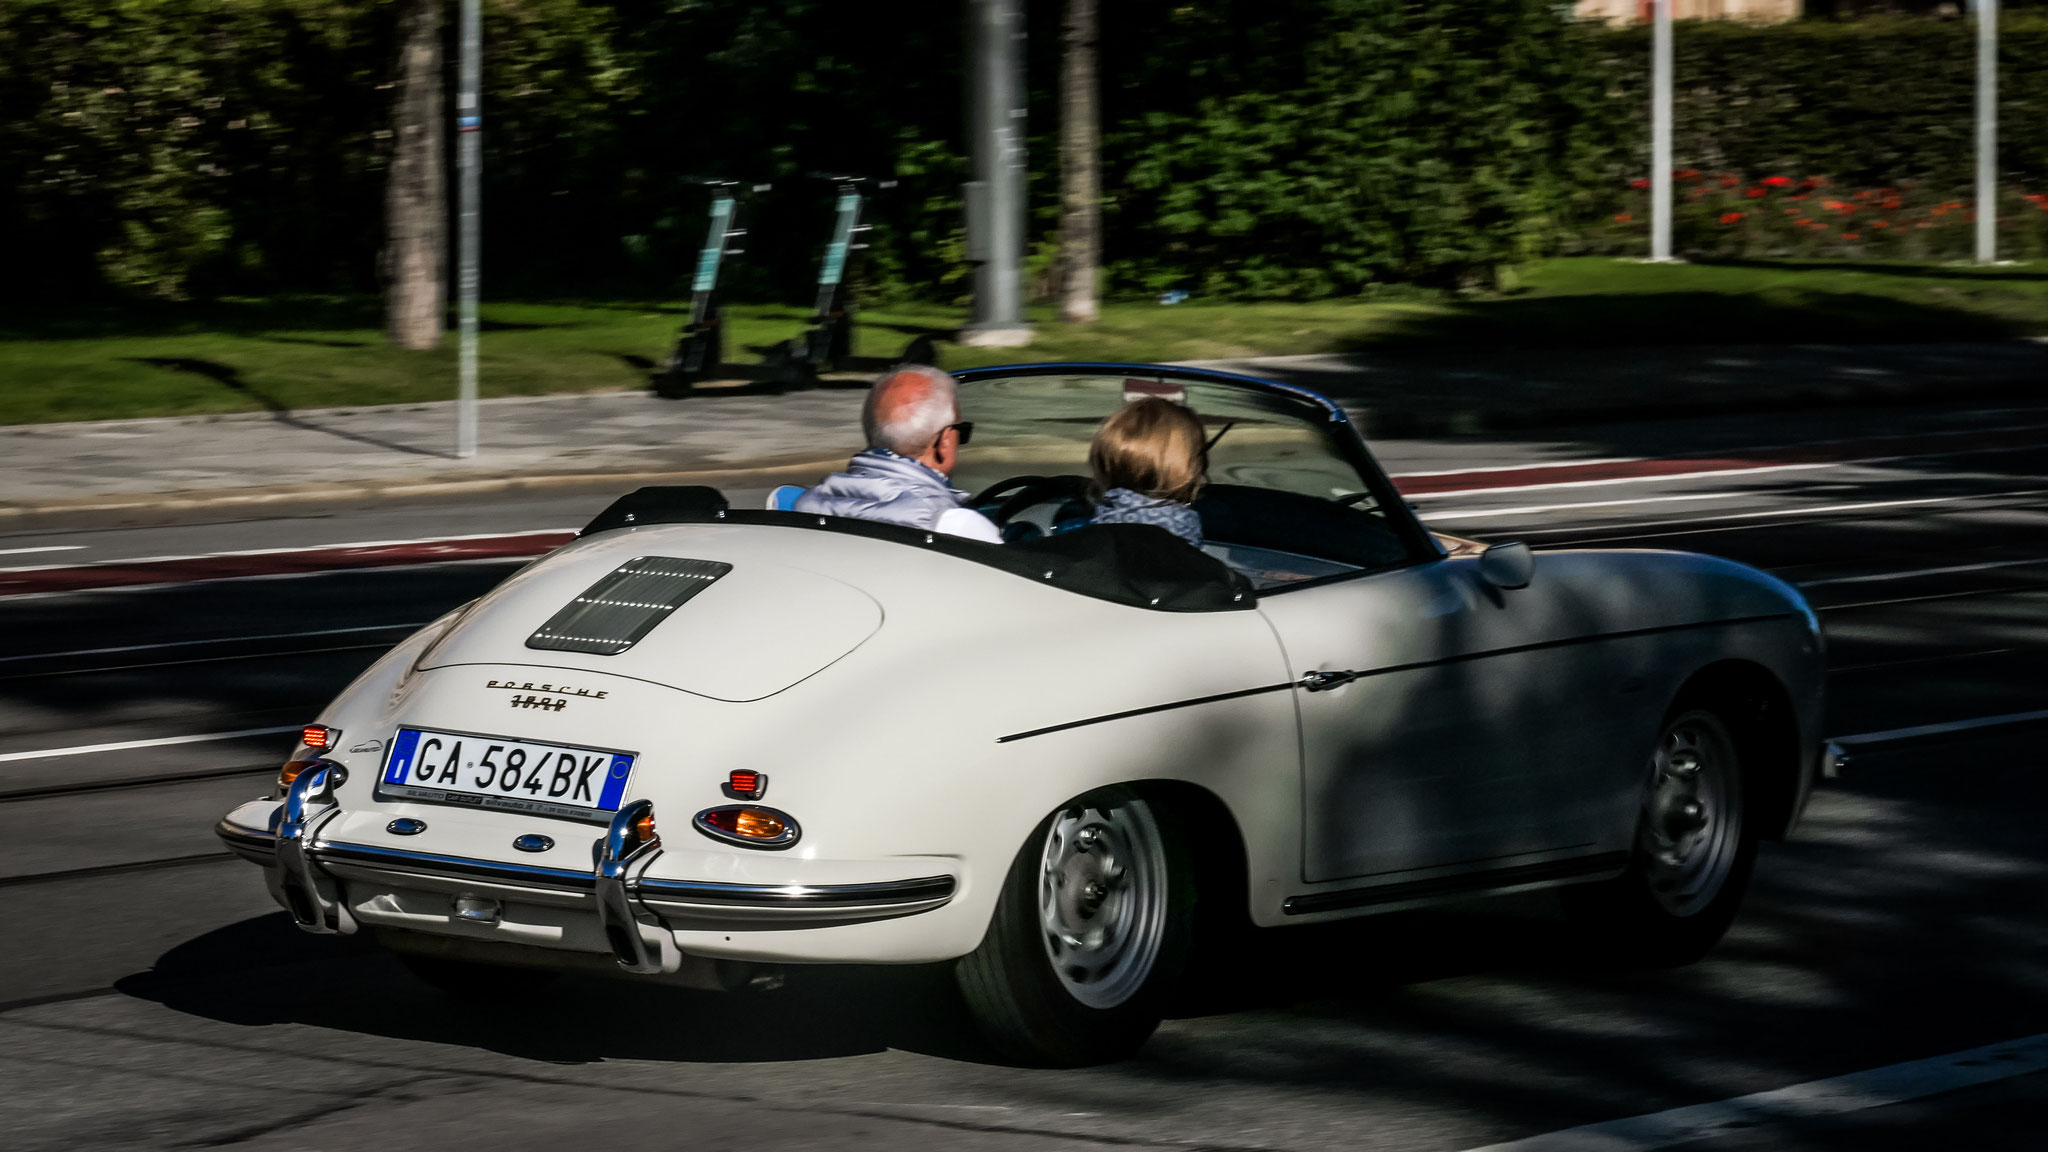 Porsche 356 1600 Super - GA-584-BK (ITA)